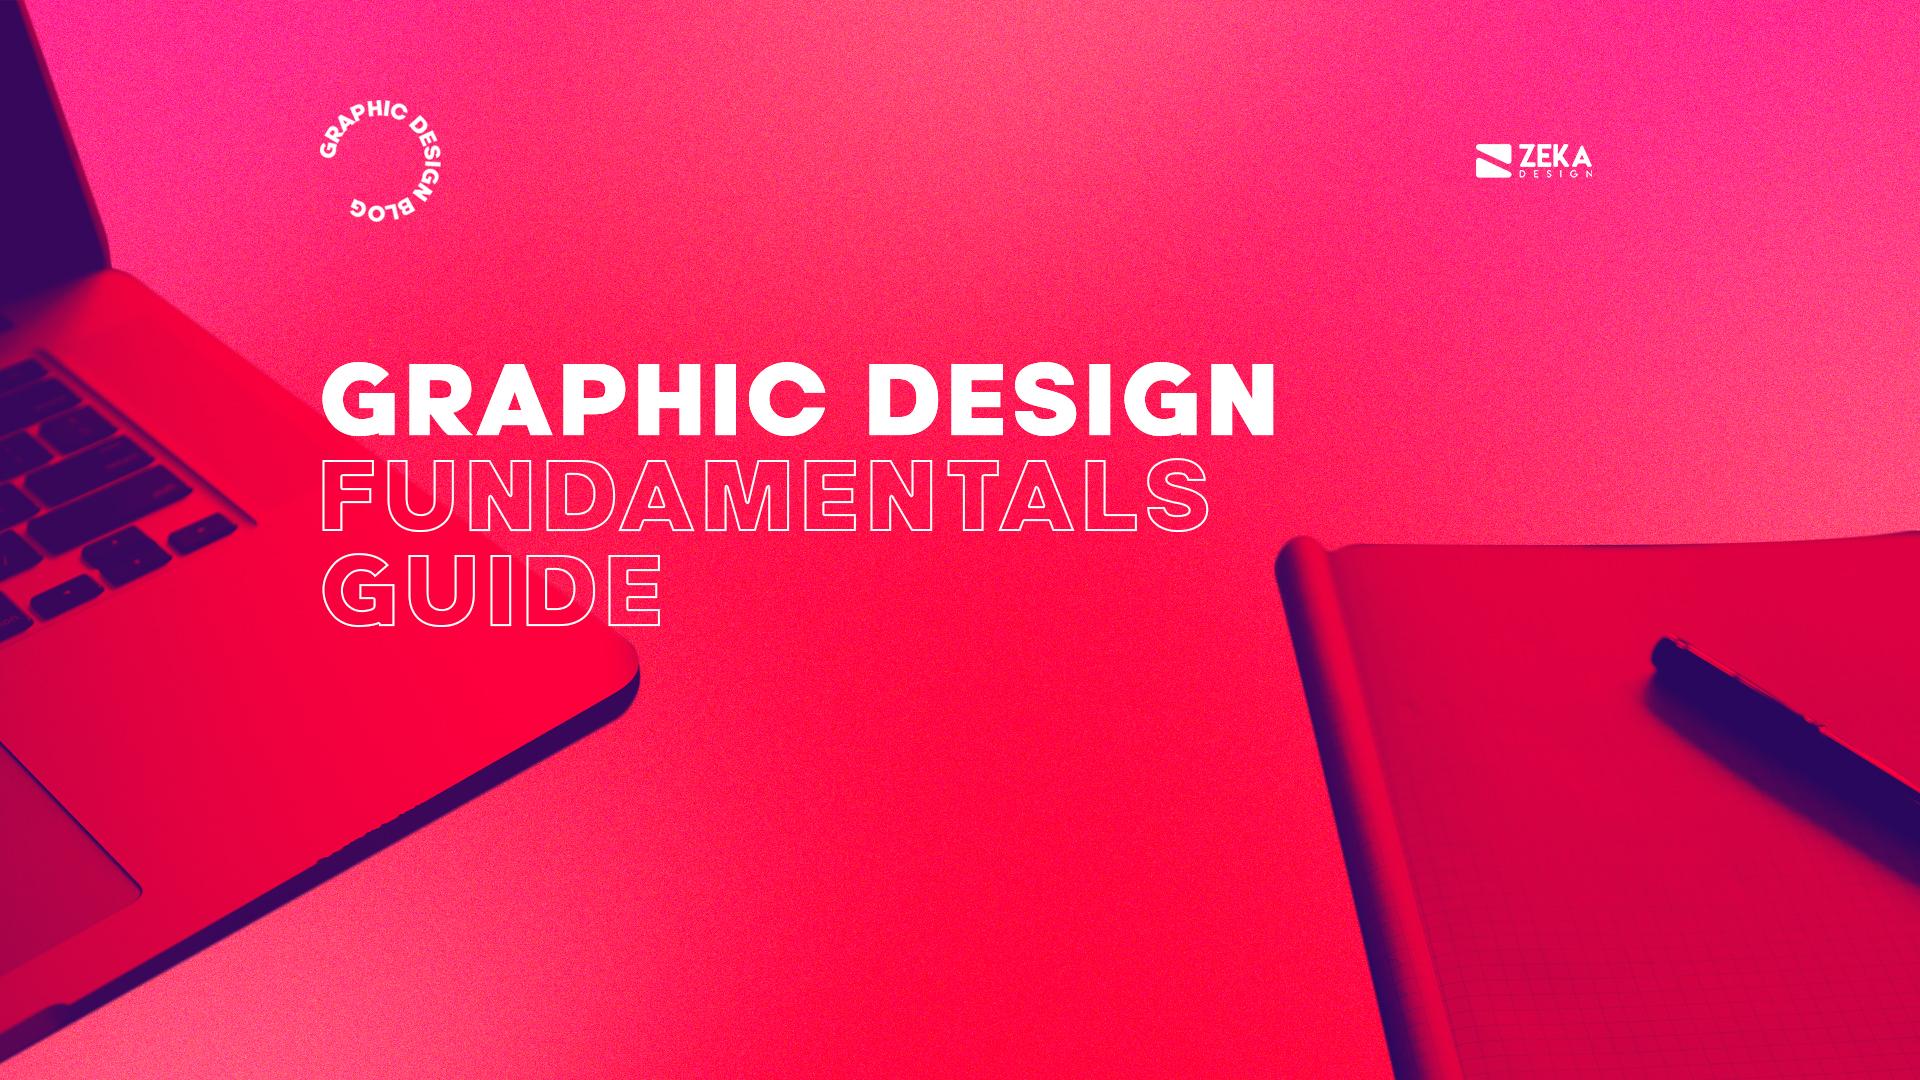 Graphic Design Fundamentals Guide 2021 Design Inspiration